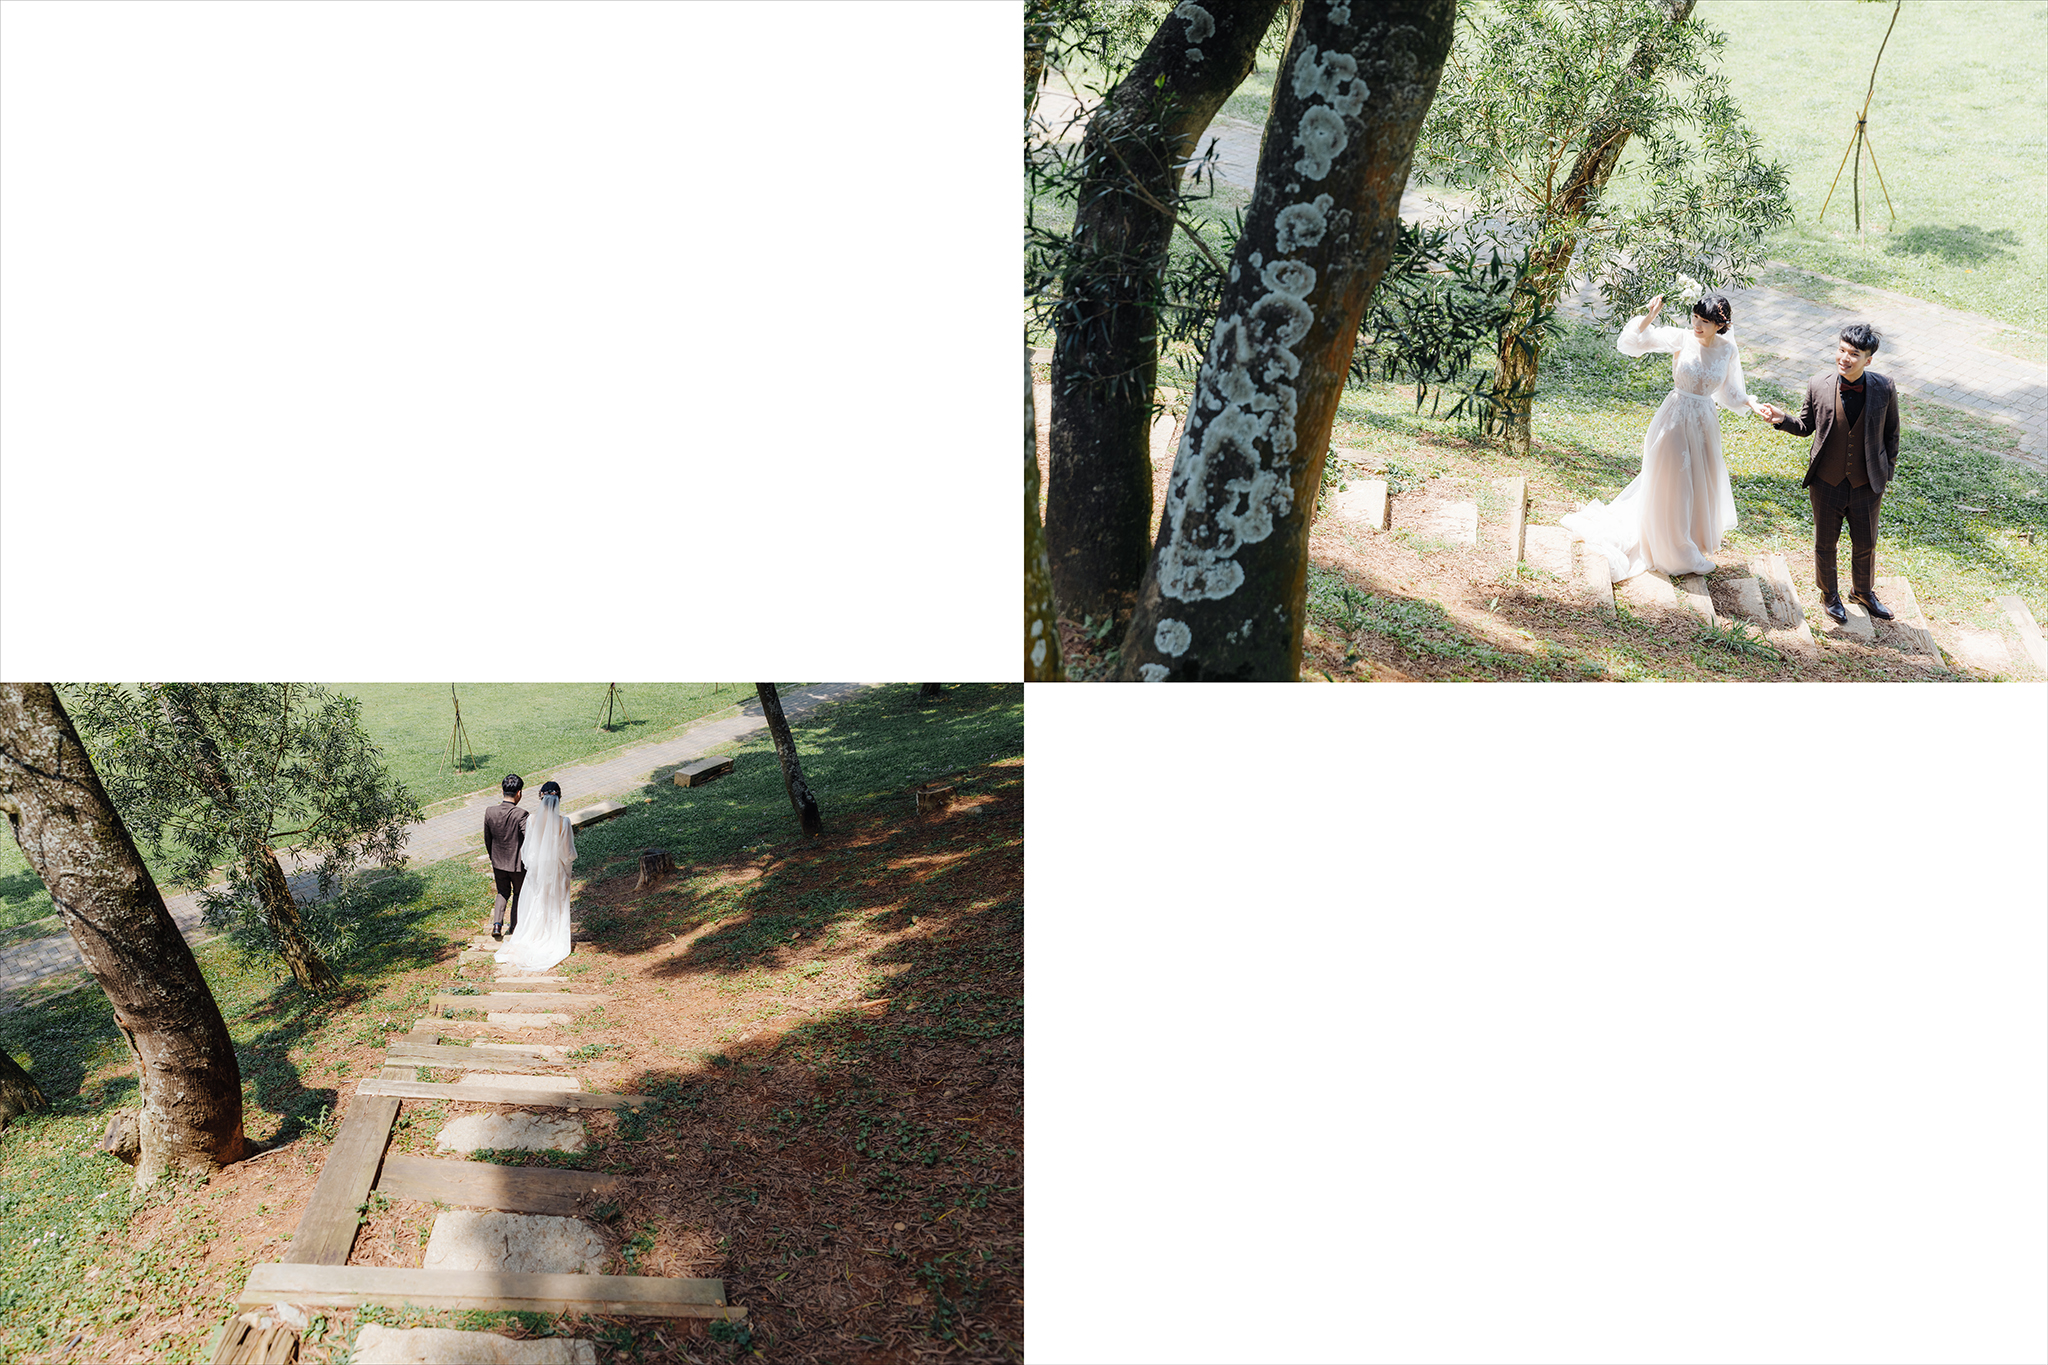 50140478986 aed231841b o - 【自助婚紗】+Vincent&Deer+